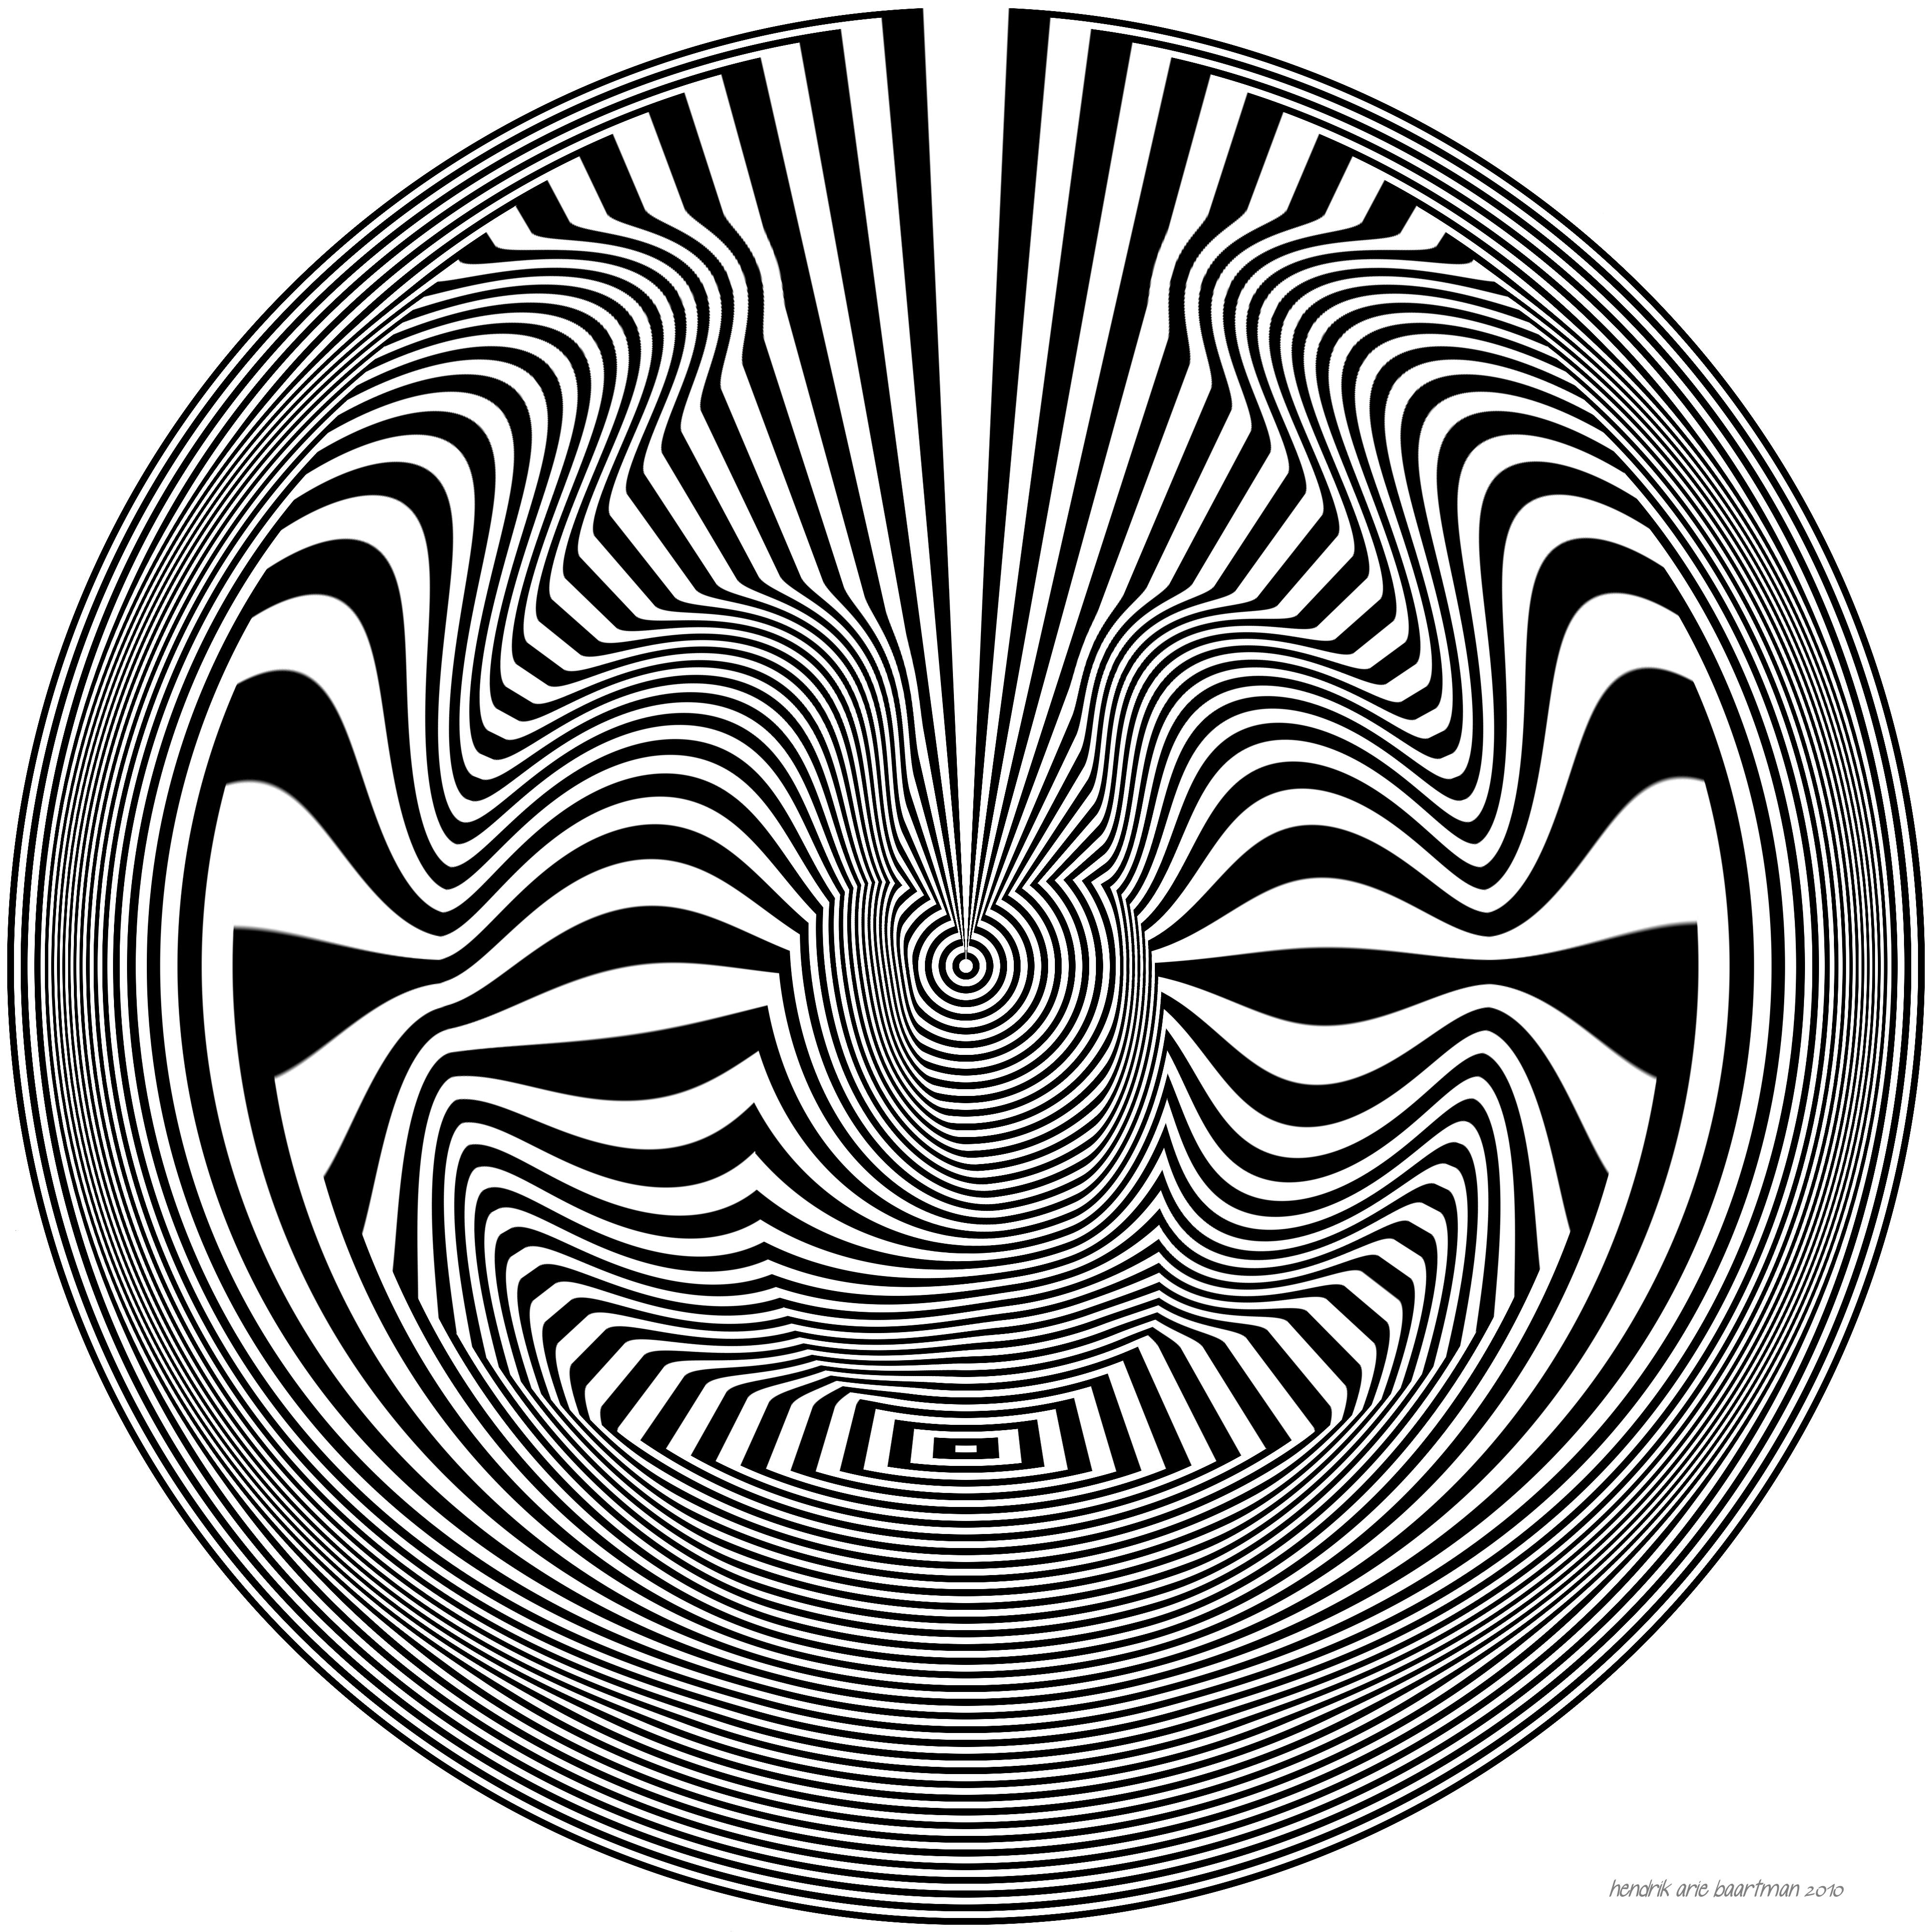 4000x4000 Kinetic Art Numero 363 By Baartman